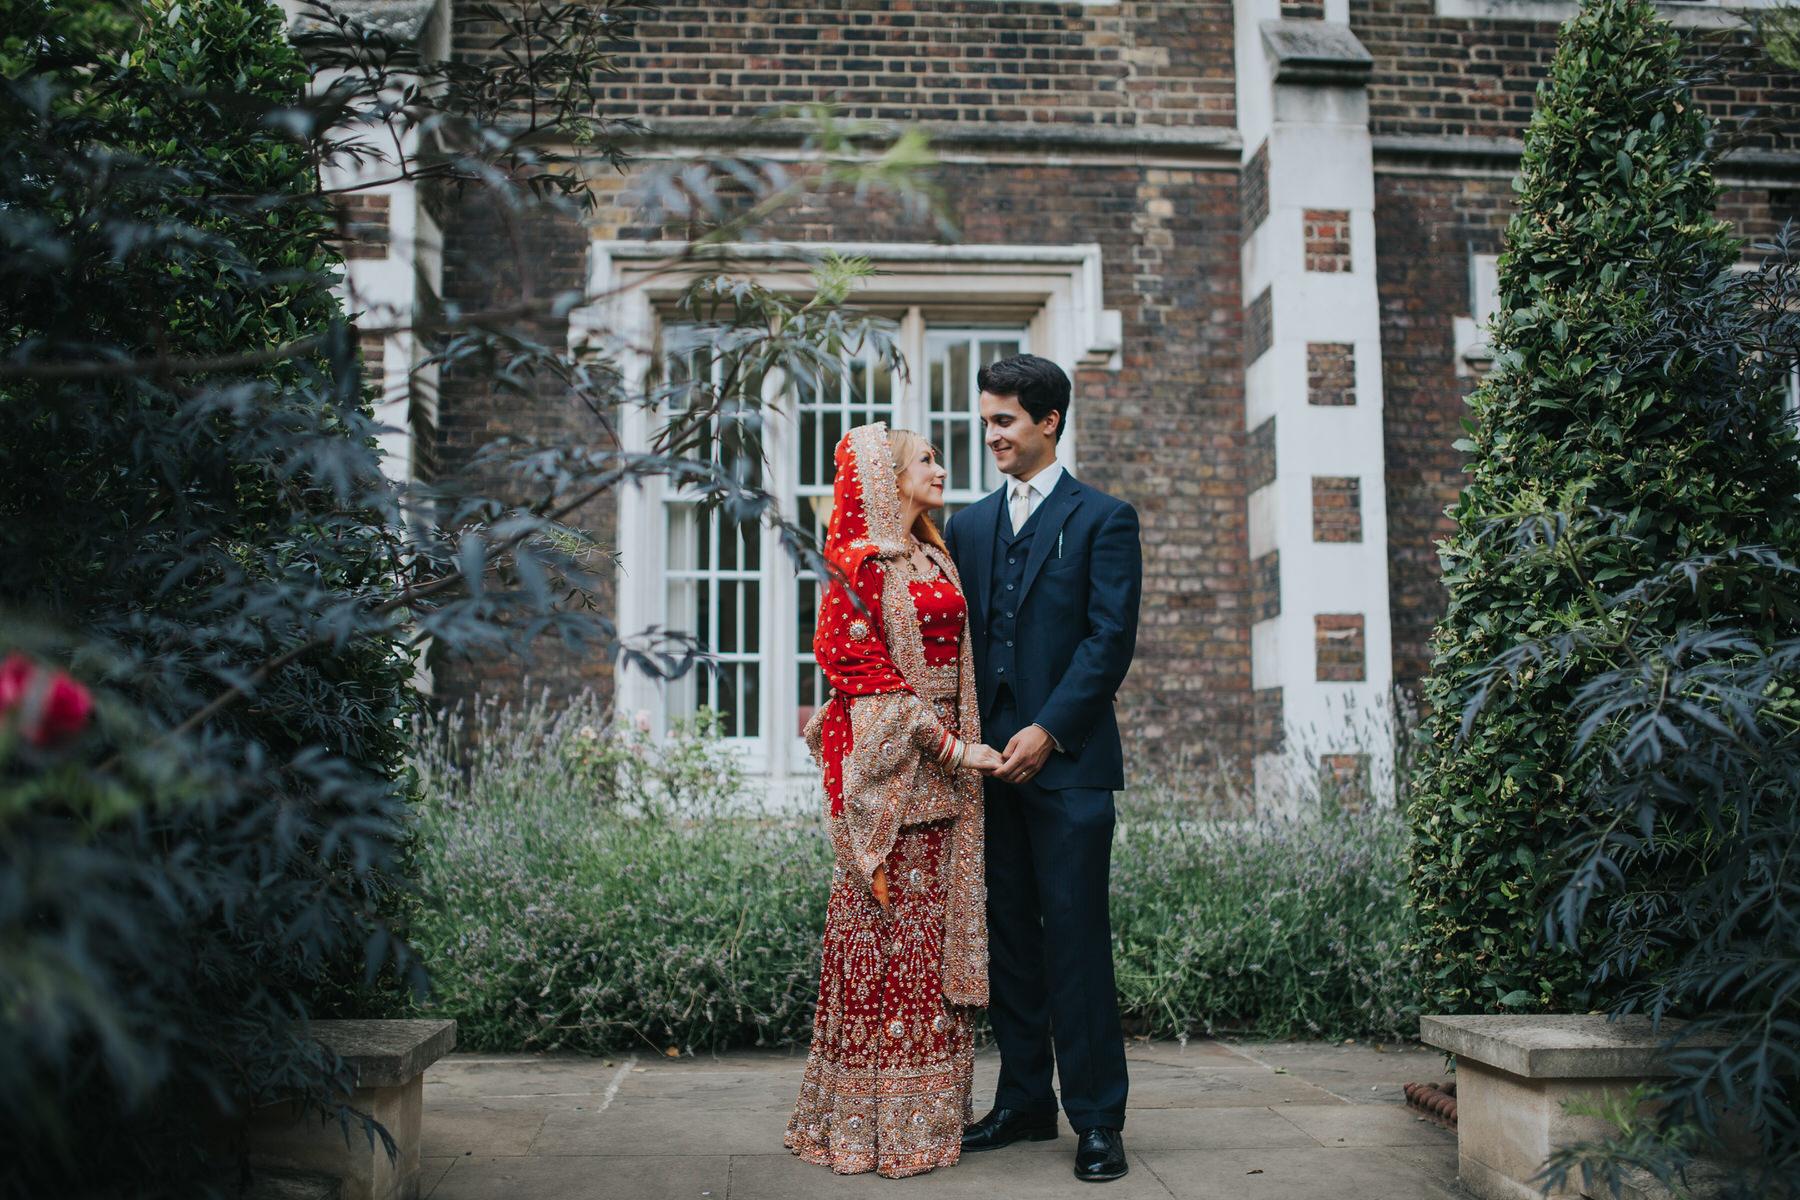 22-Anglo-Asian-London-Wedding-Middle-temple-bride-groom-posing-garden.jpg